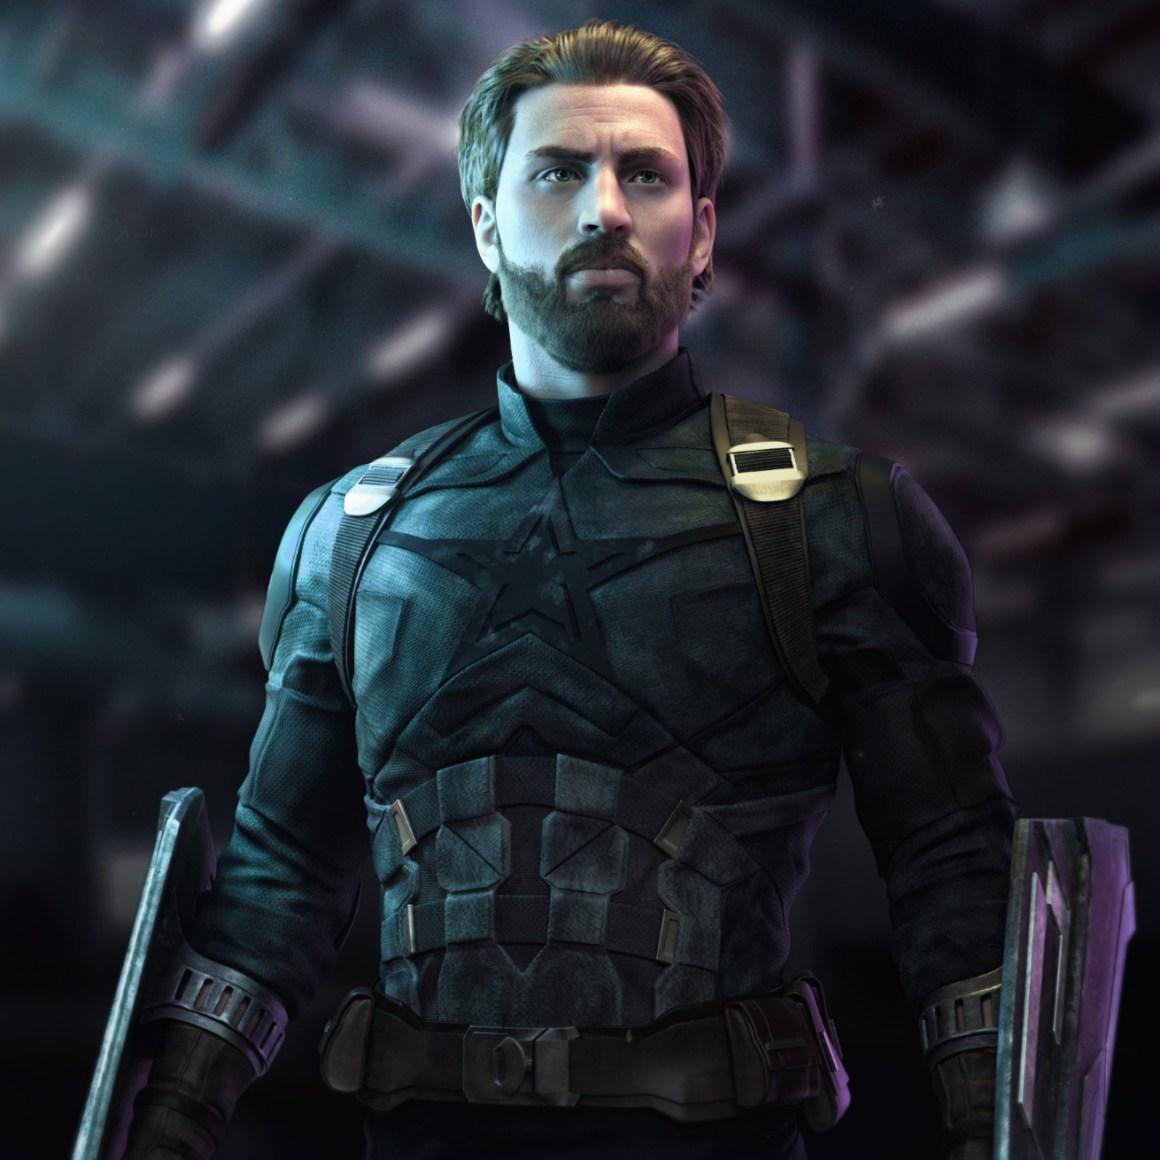 Captain America - Infinity war by Vladimir Minguillo